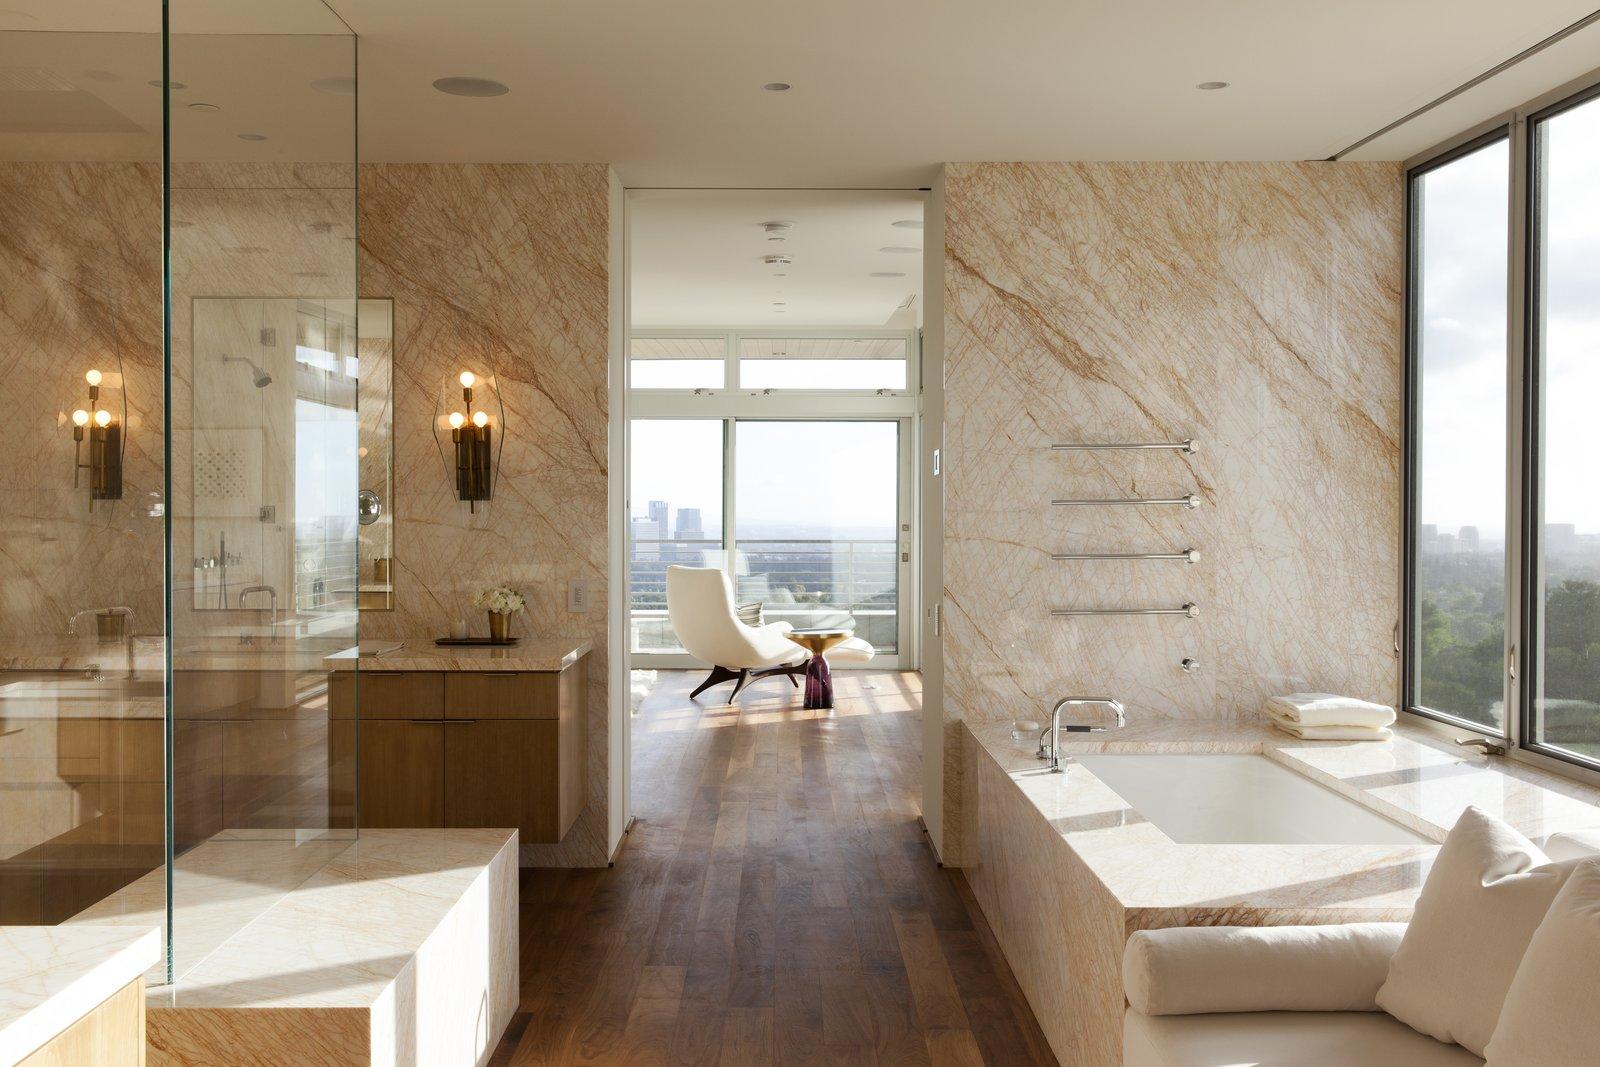 Bath Room, Drop In Tub, Marble Wall, Accent Lighting, Drop In Sink, Medium Hardwood Floor, and Marble Counter  Summitridge by Marmol Radziner